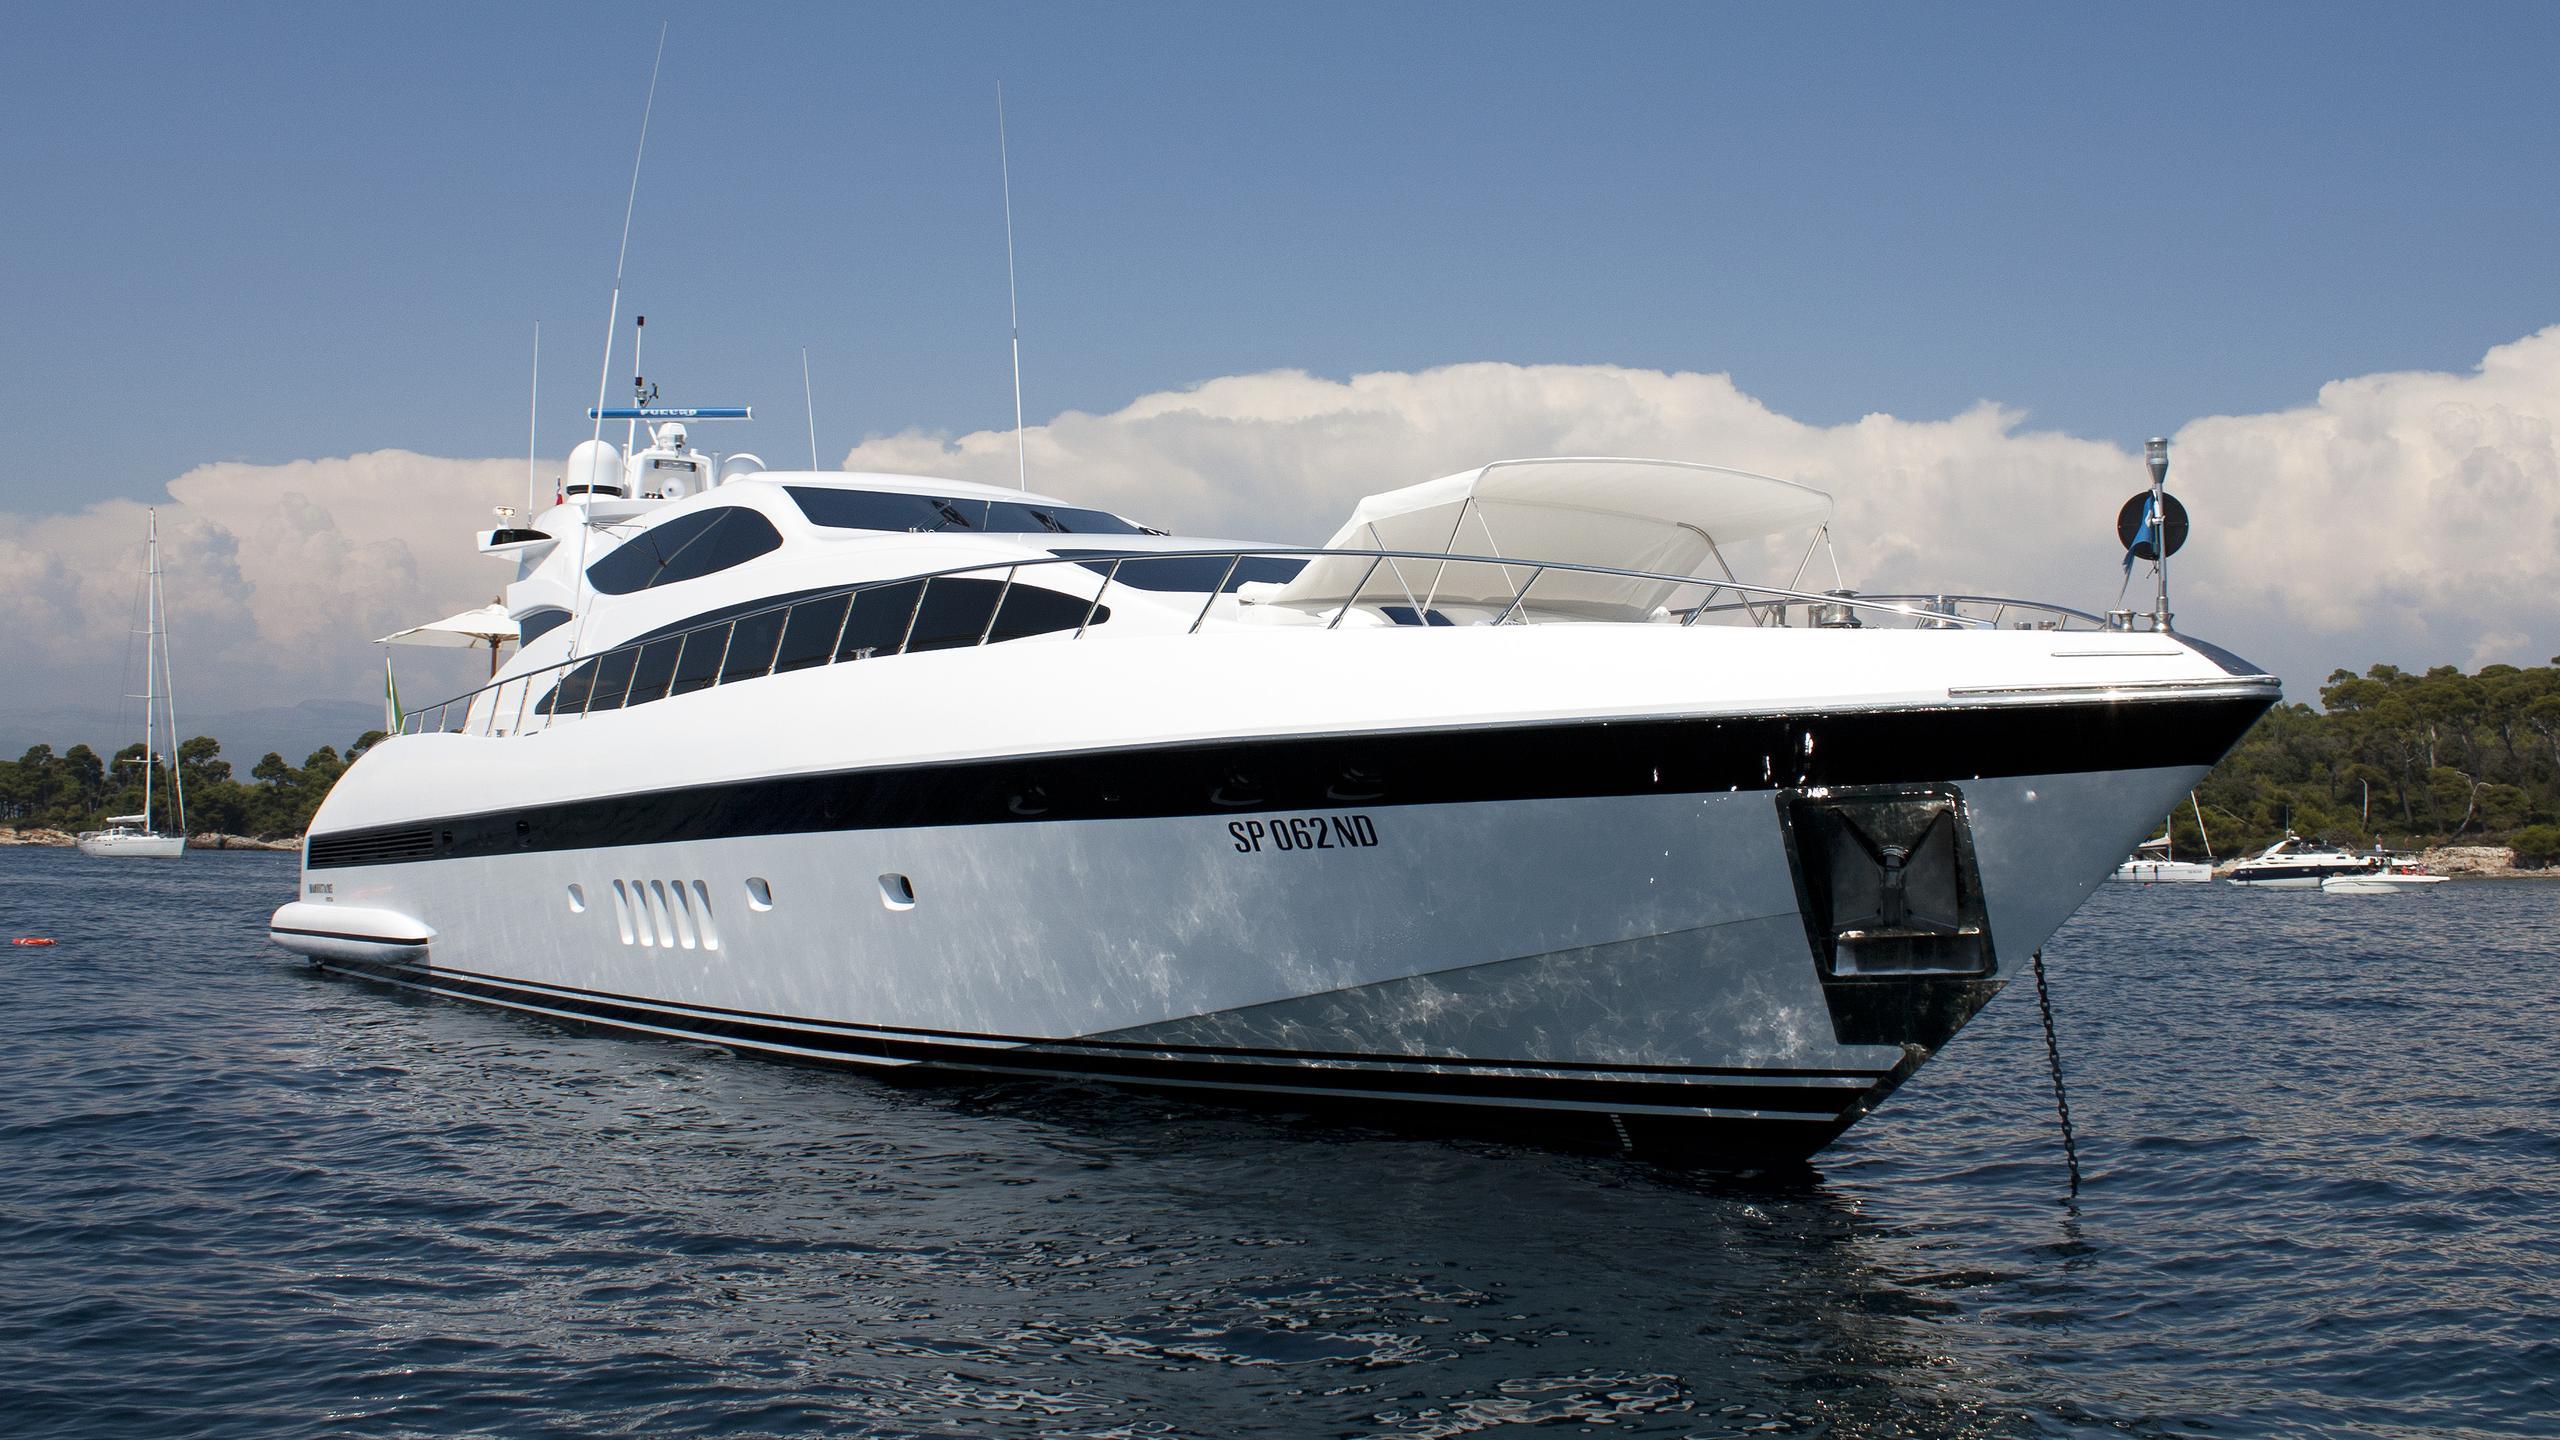 allure-motor-yacht-overmarine-mangusta-105-sport-2003-31m-half-profile